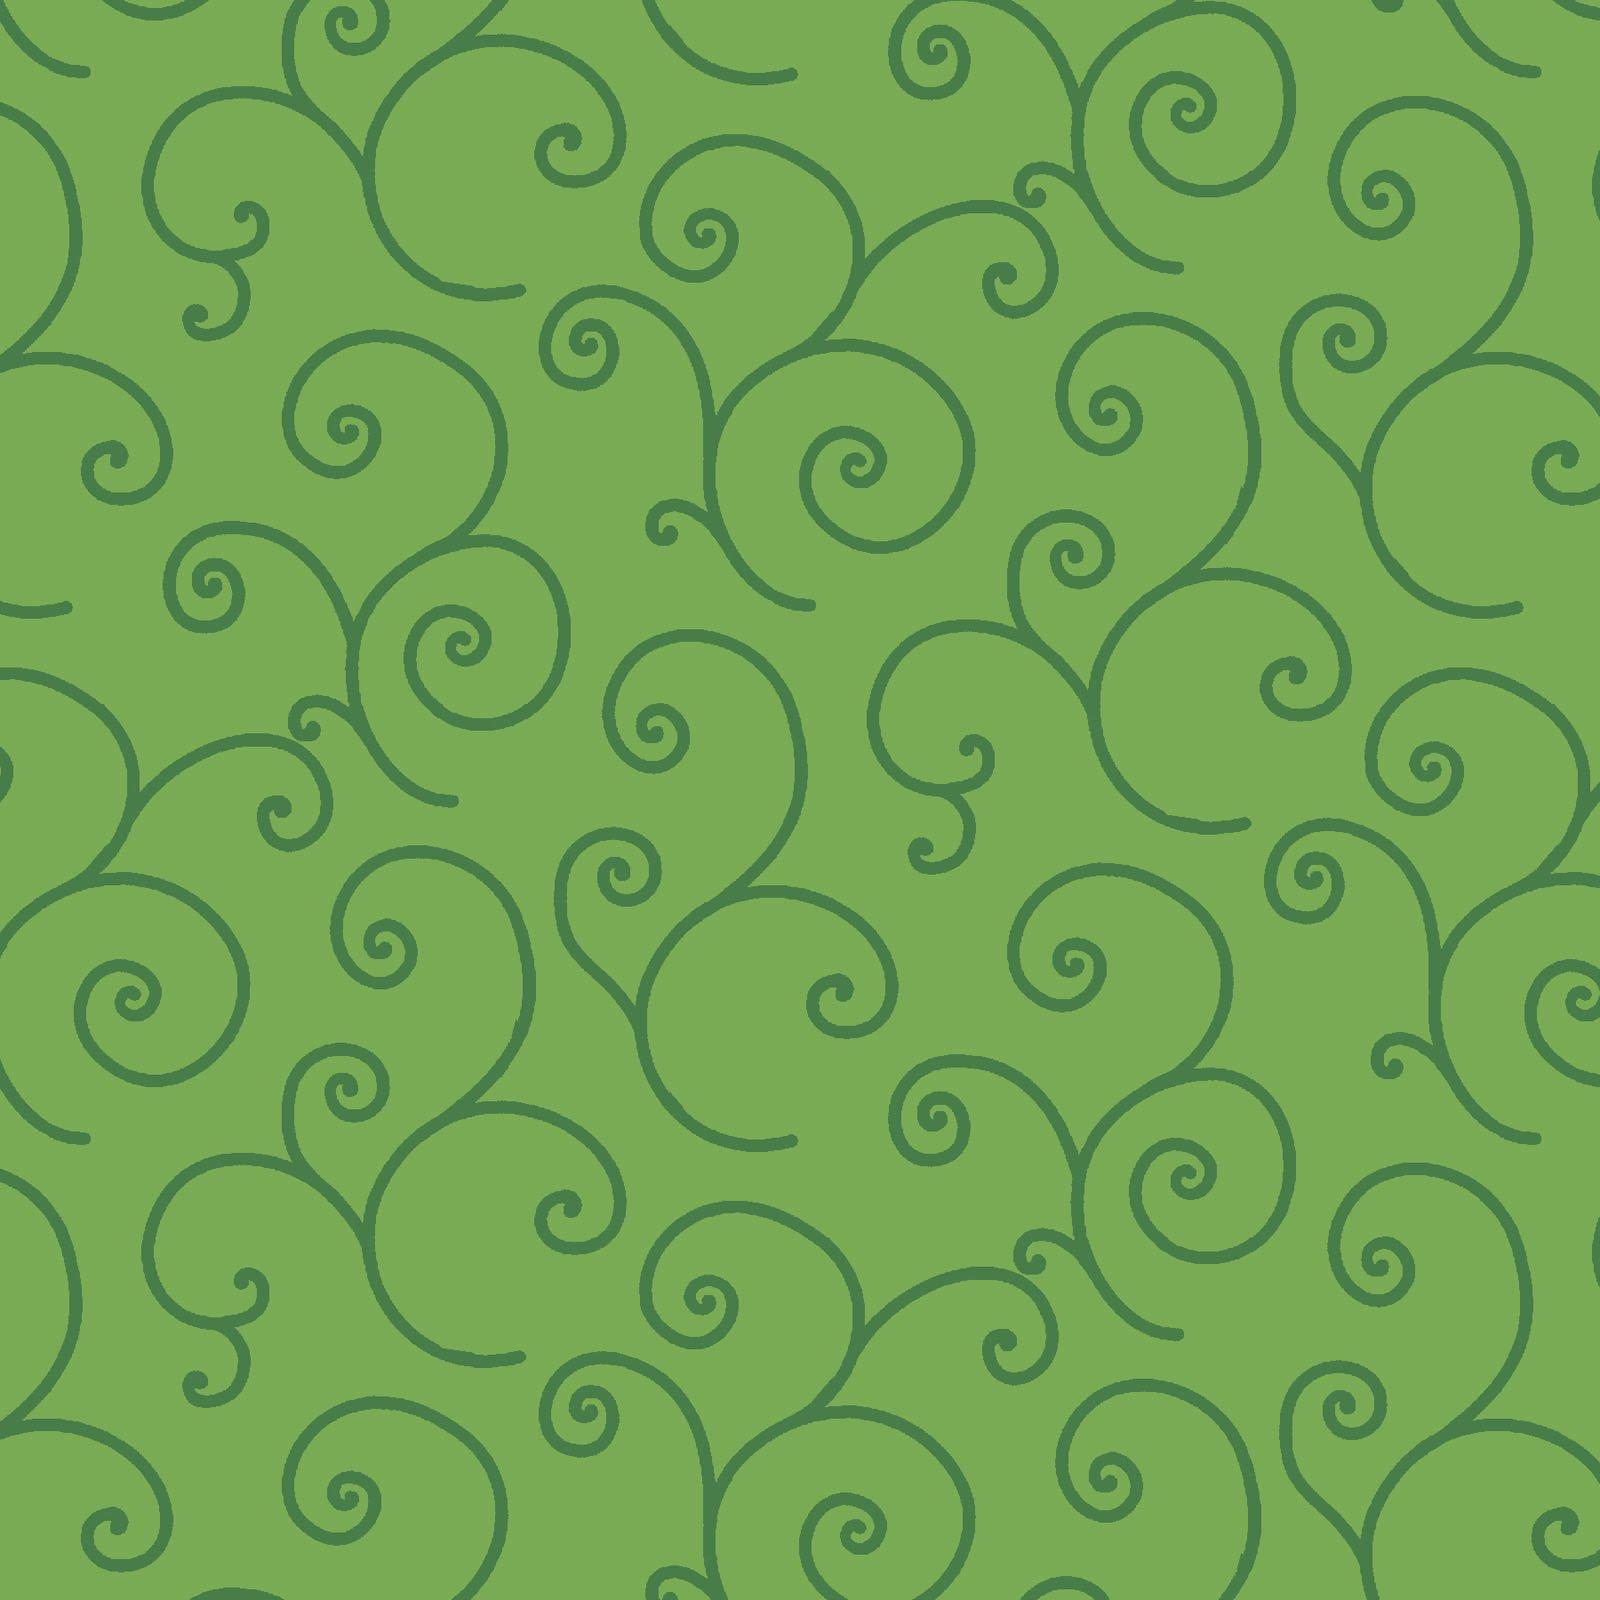 KimberBell Basics Green Scroll  8243M-GG